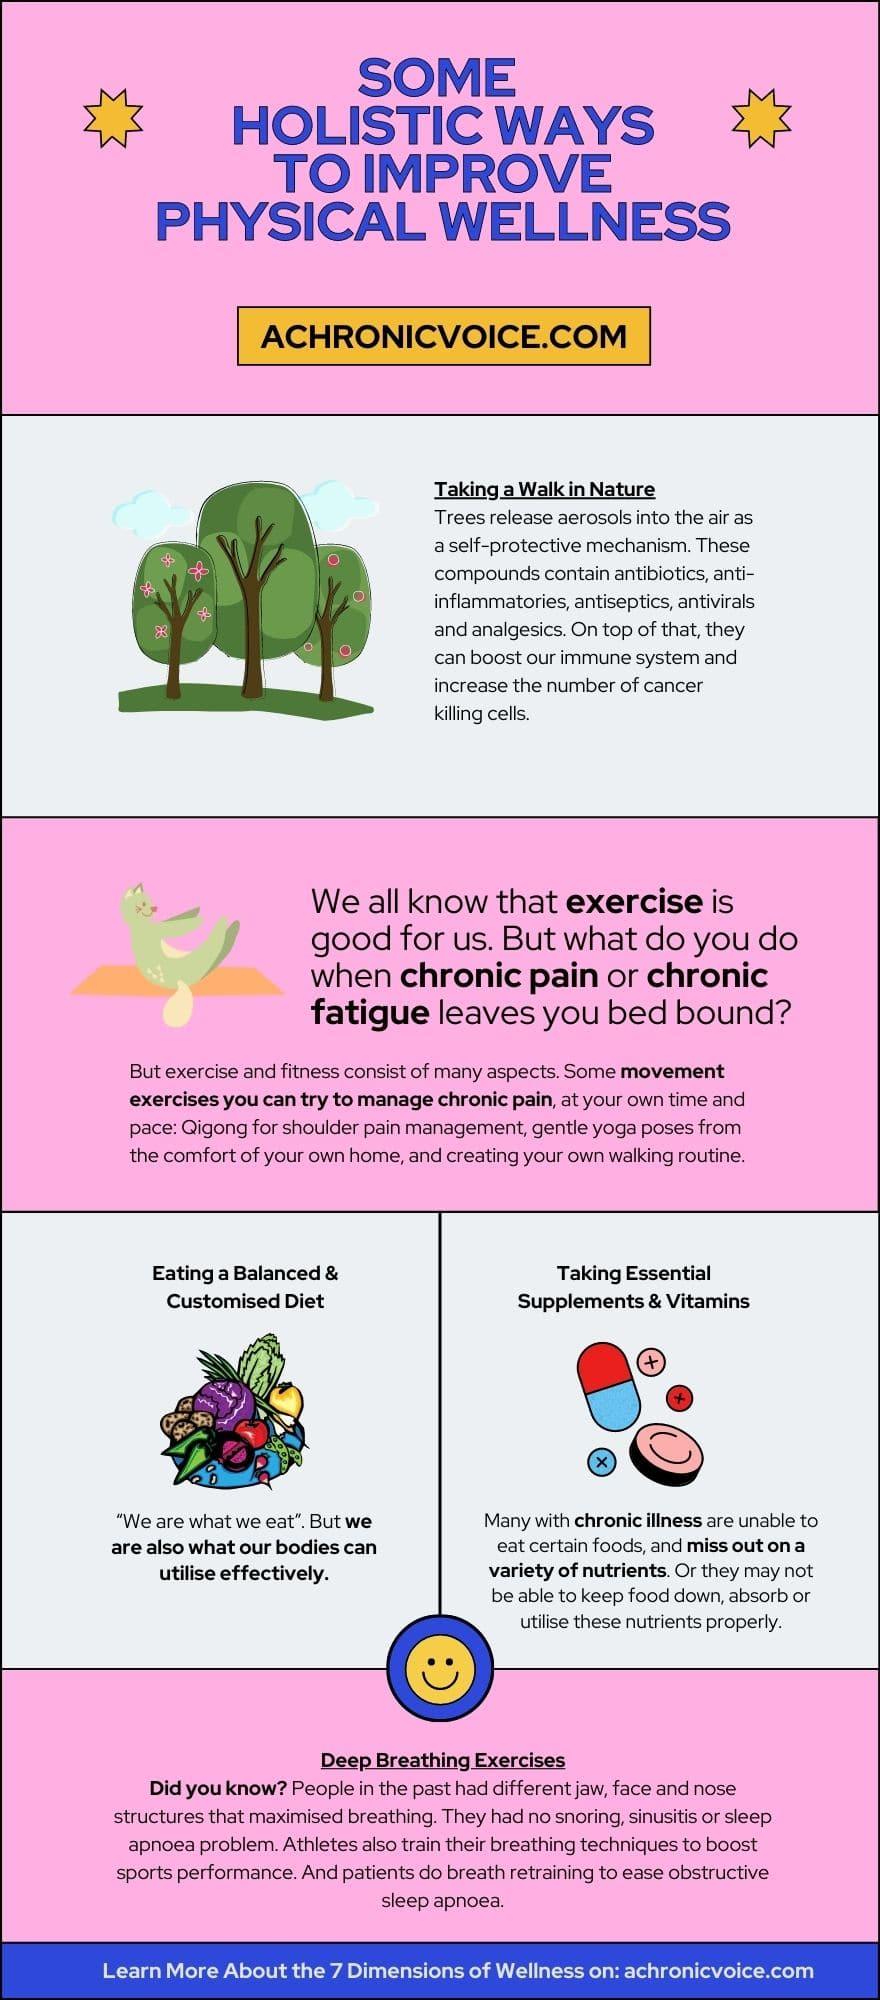 Holistic Ways to Improve Physical Wellness